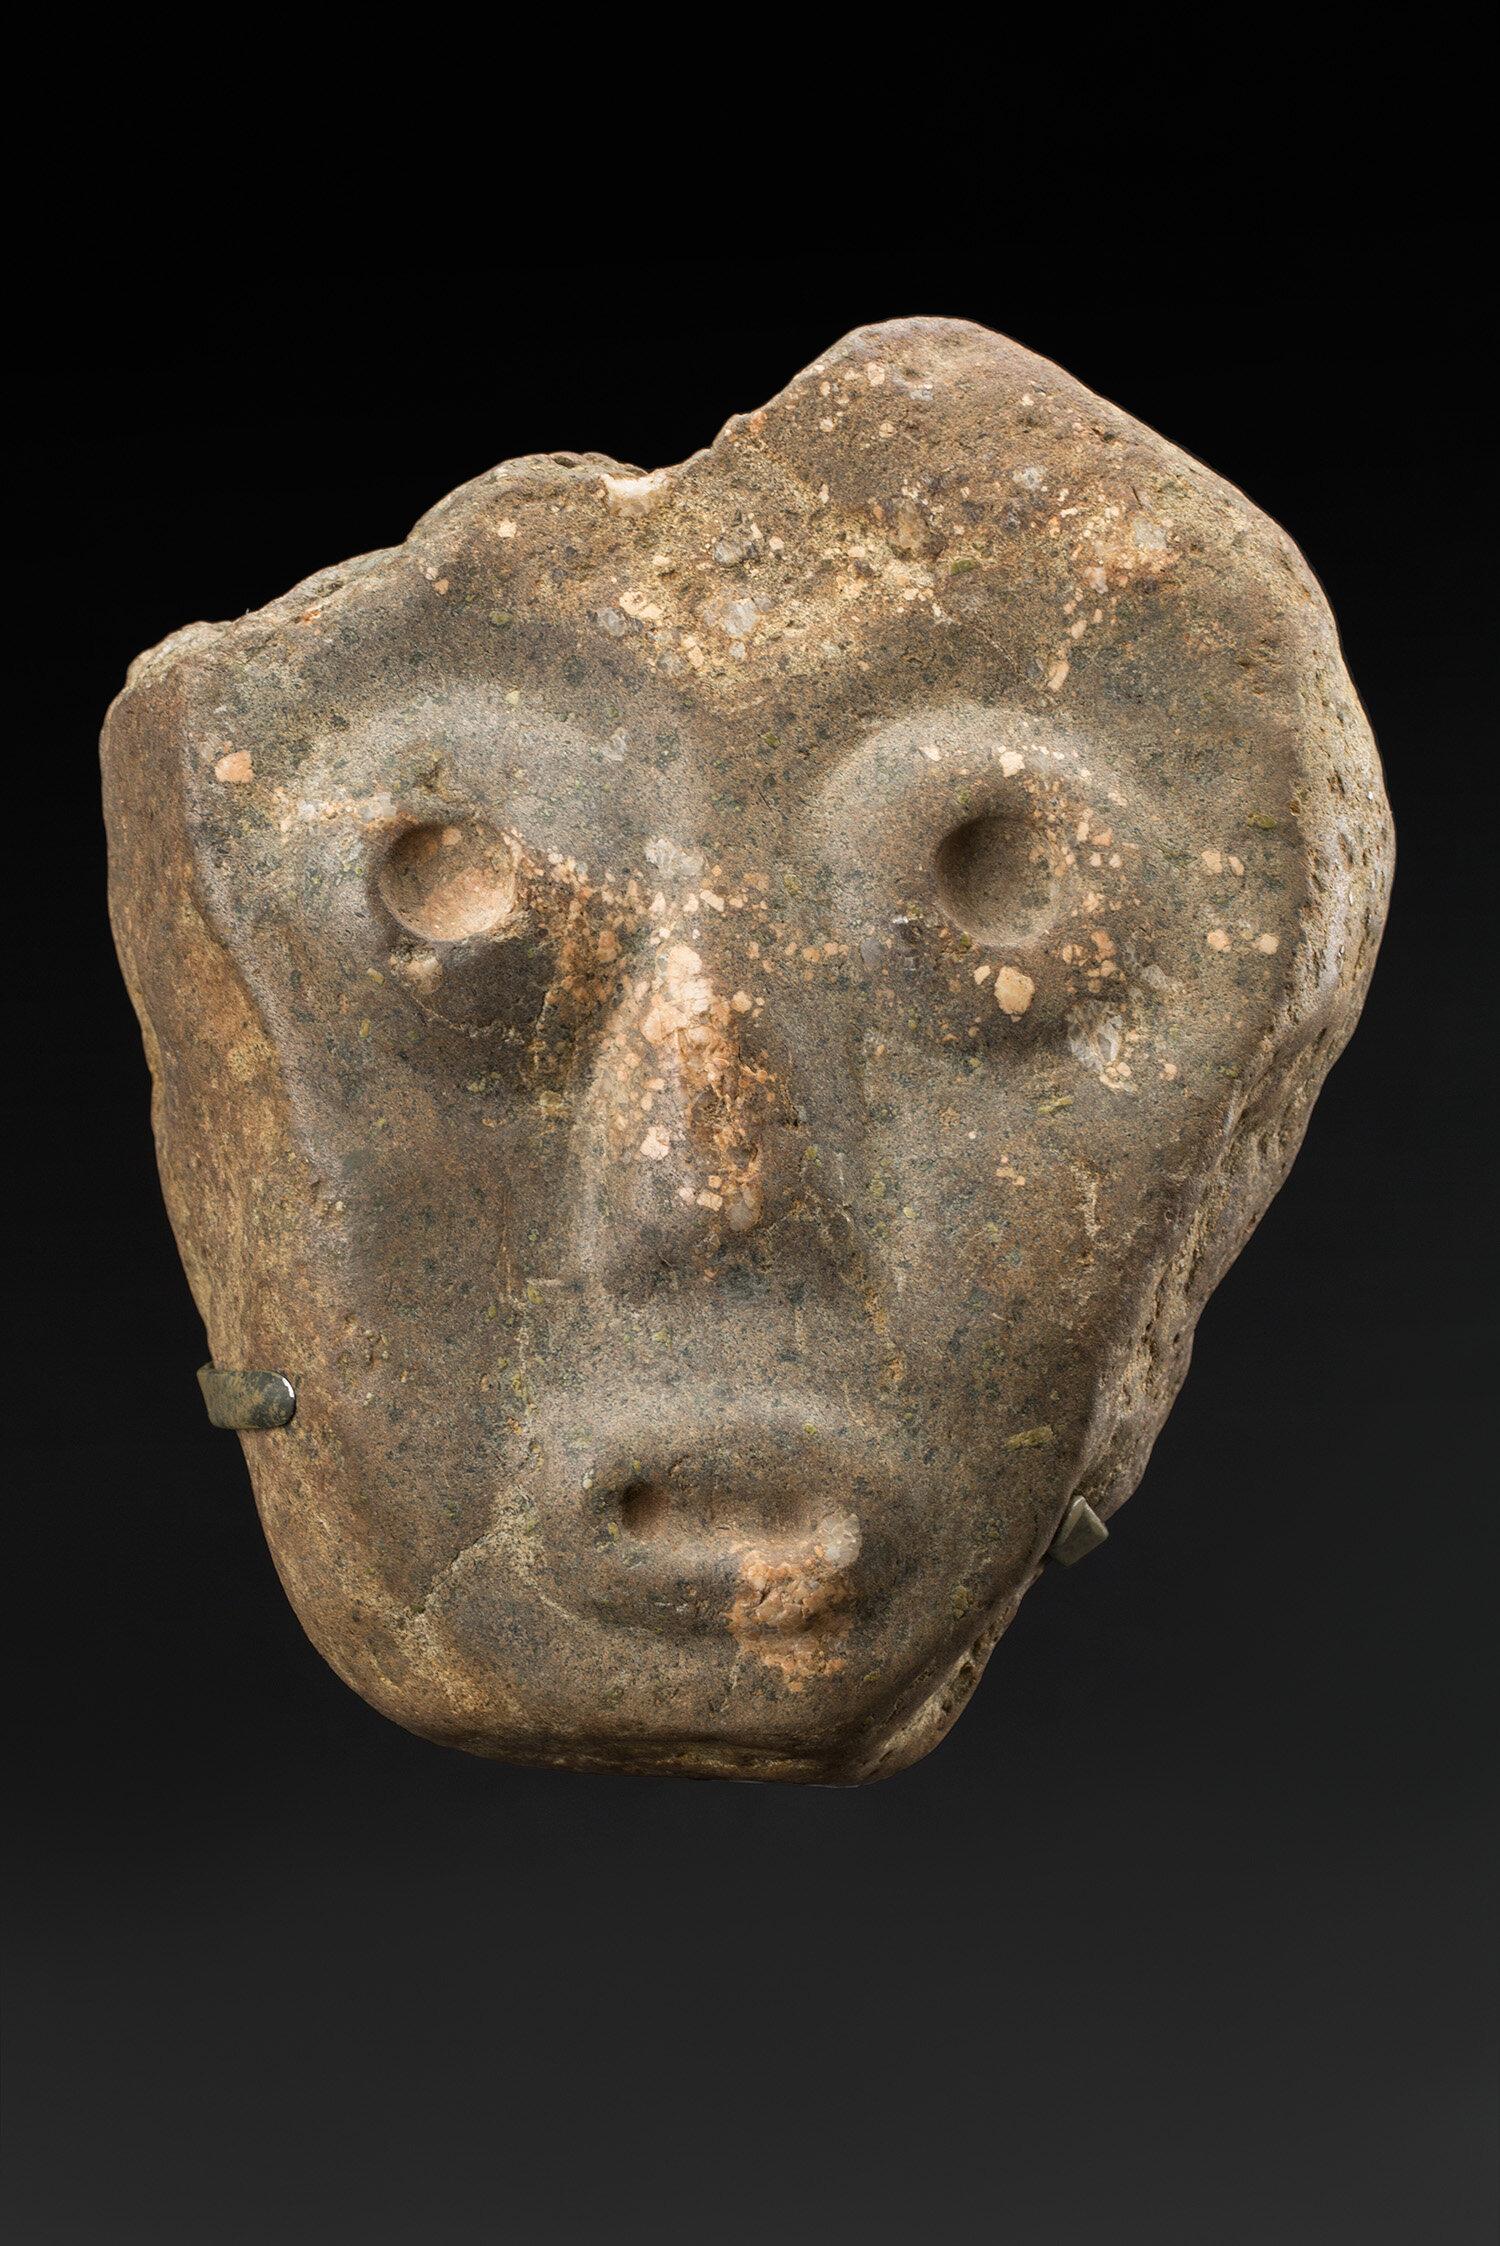 Masks  Guerrero  , ca 3500-2200 BCE Stone 5.75 x 5 x 2.25 inches 14.6 x 12.7 x 5.7 cm M 405